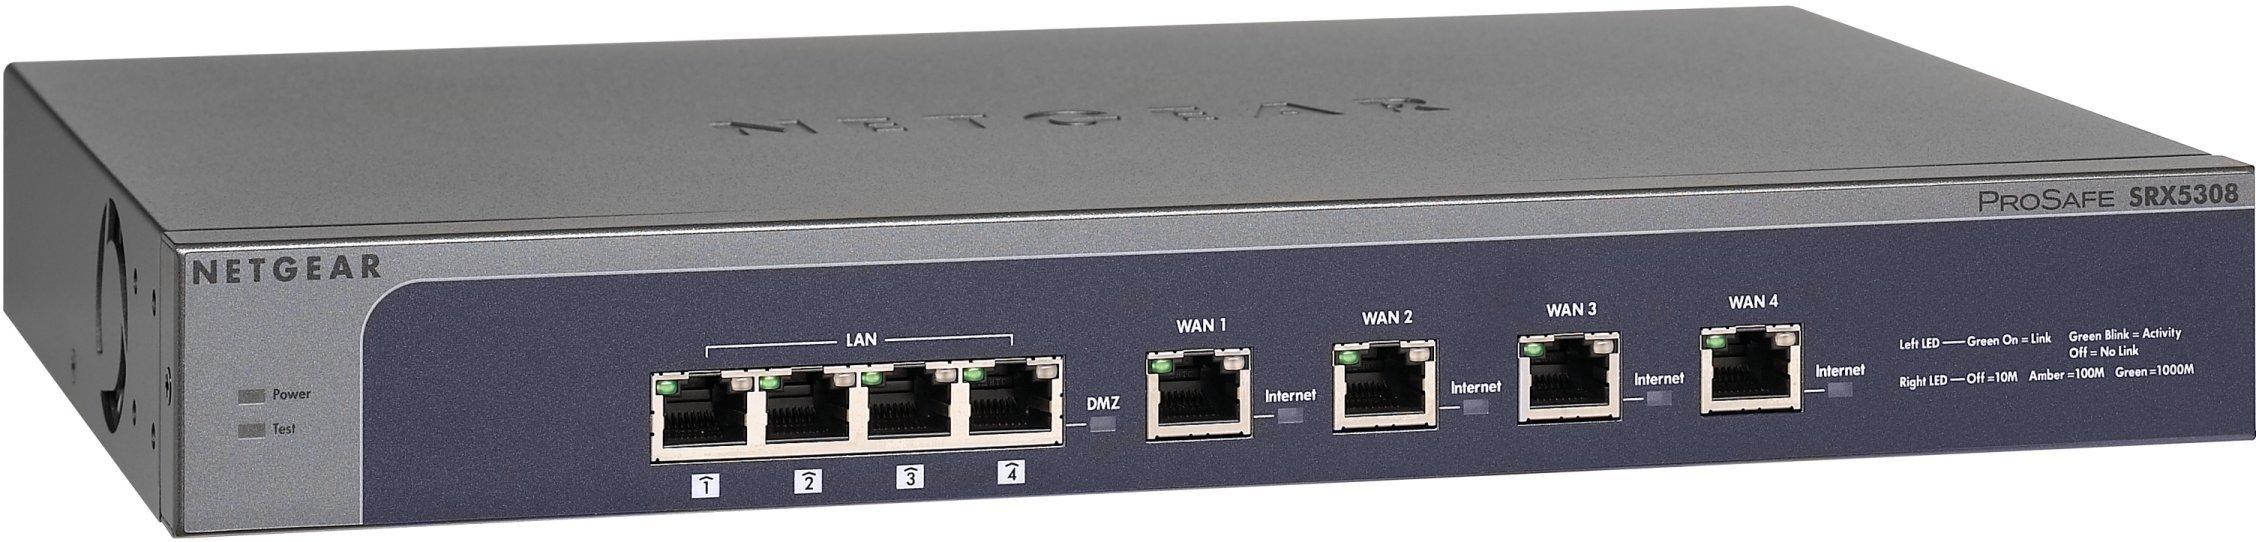 NETGEAR ProSAFE SRX5308 Quad WAN VPN Firewall with SSL and IPSec VPN (SRX5308-100NAS)